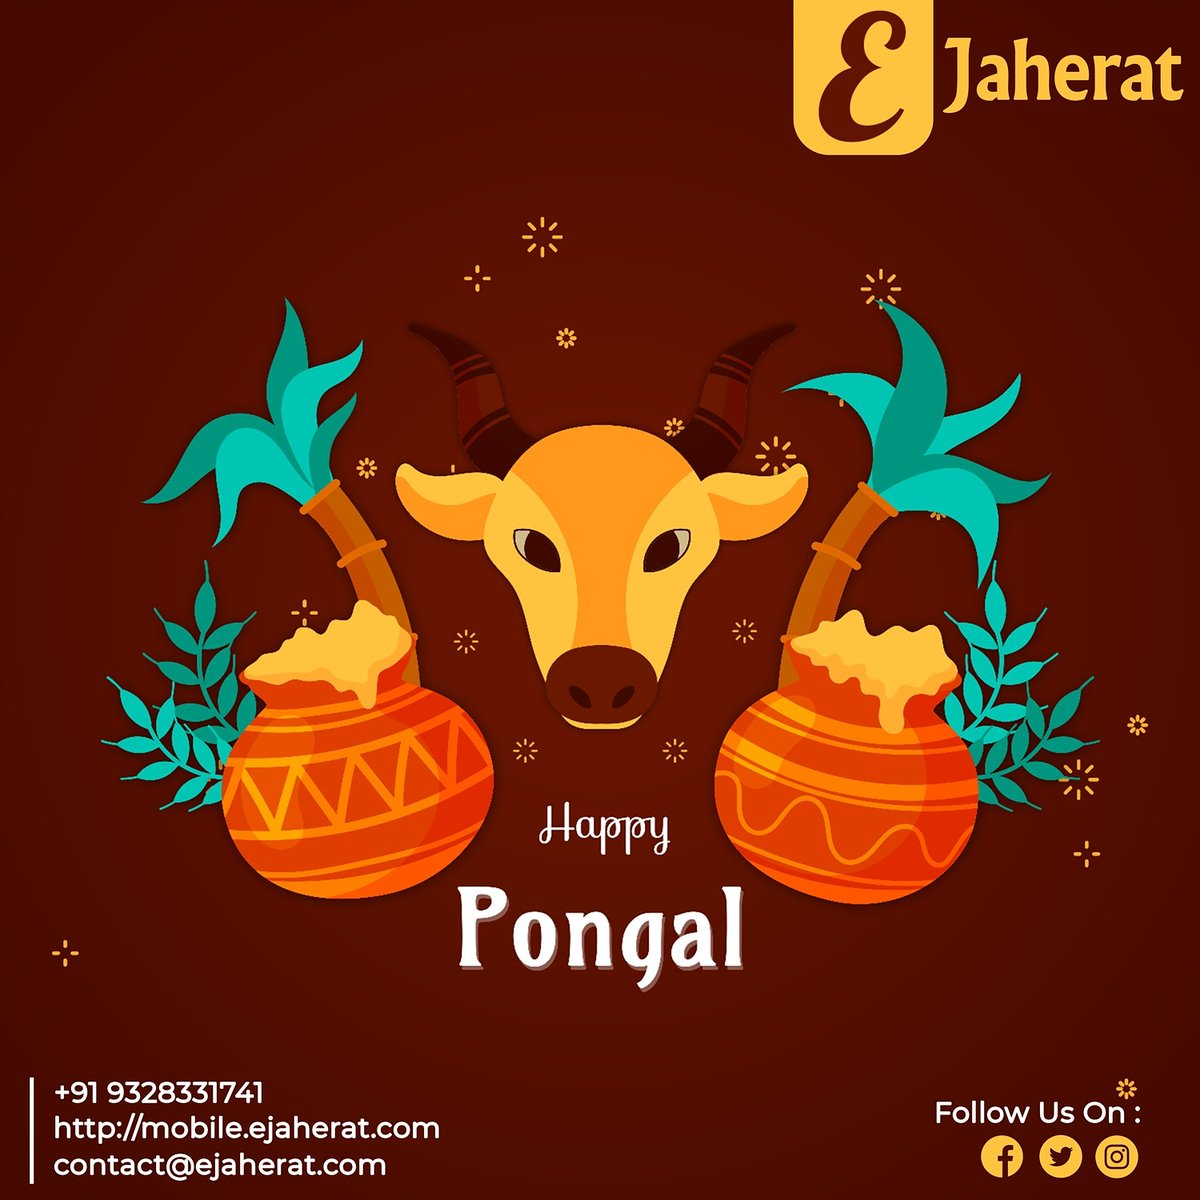 Happy Pongal  #pongal #pongalcelebration #thaipongal #harvest #harvestfestival #tamil #hindu #hindufestival #lordshiva #lordindra #kerala #tamilnadu #eJaherat #socialmedia #nationalday #topicoftheday #festiveseason #festival #graphicdesign #posterdesign #post #postermaker